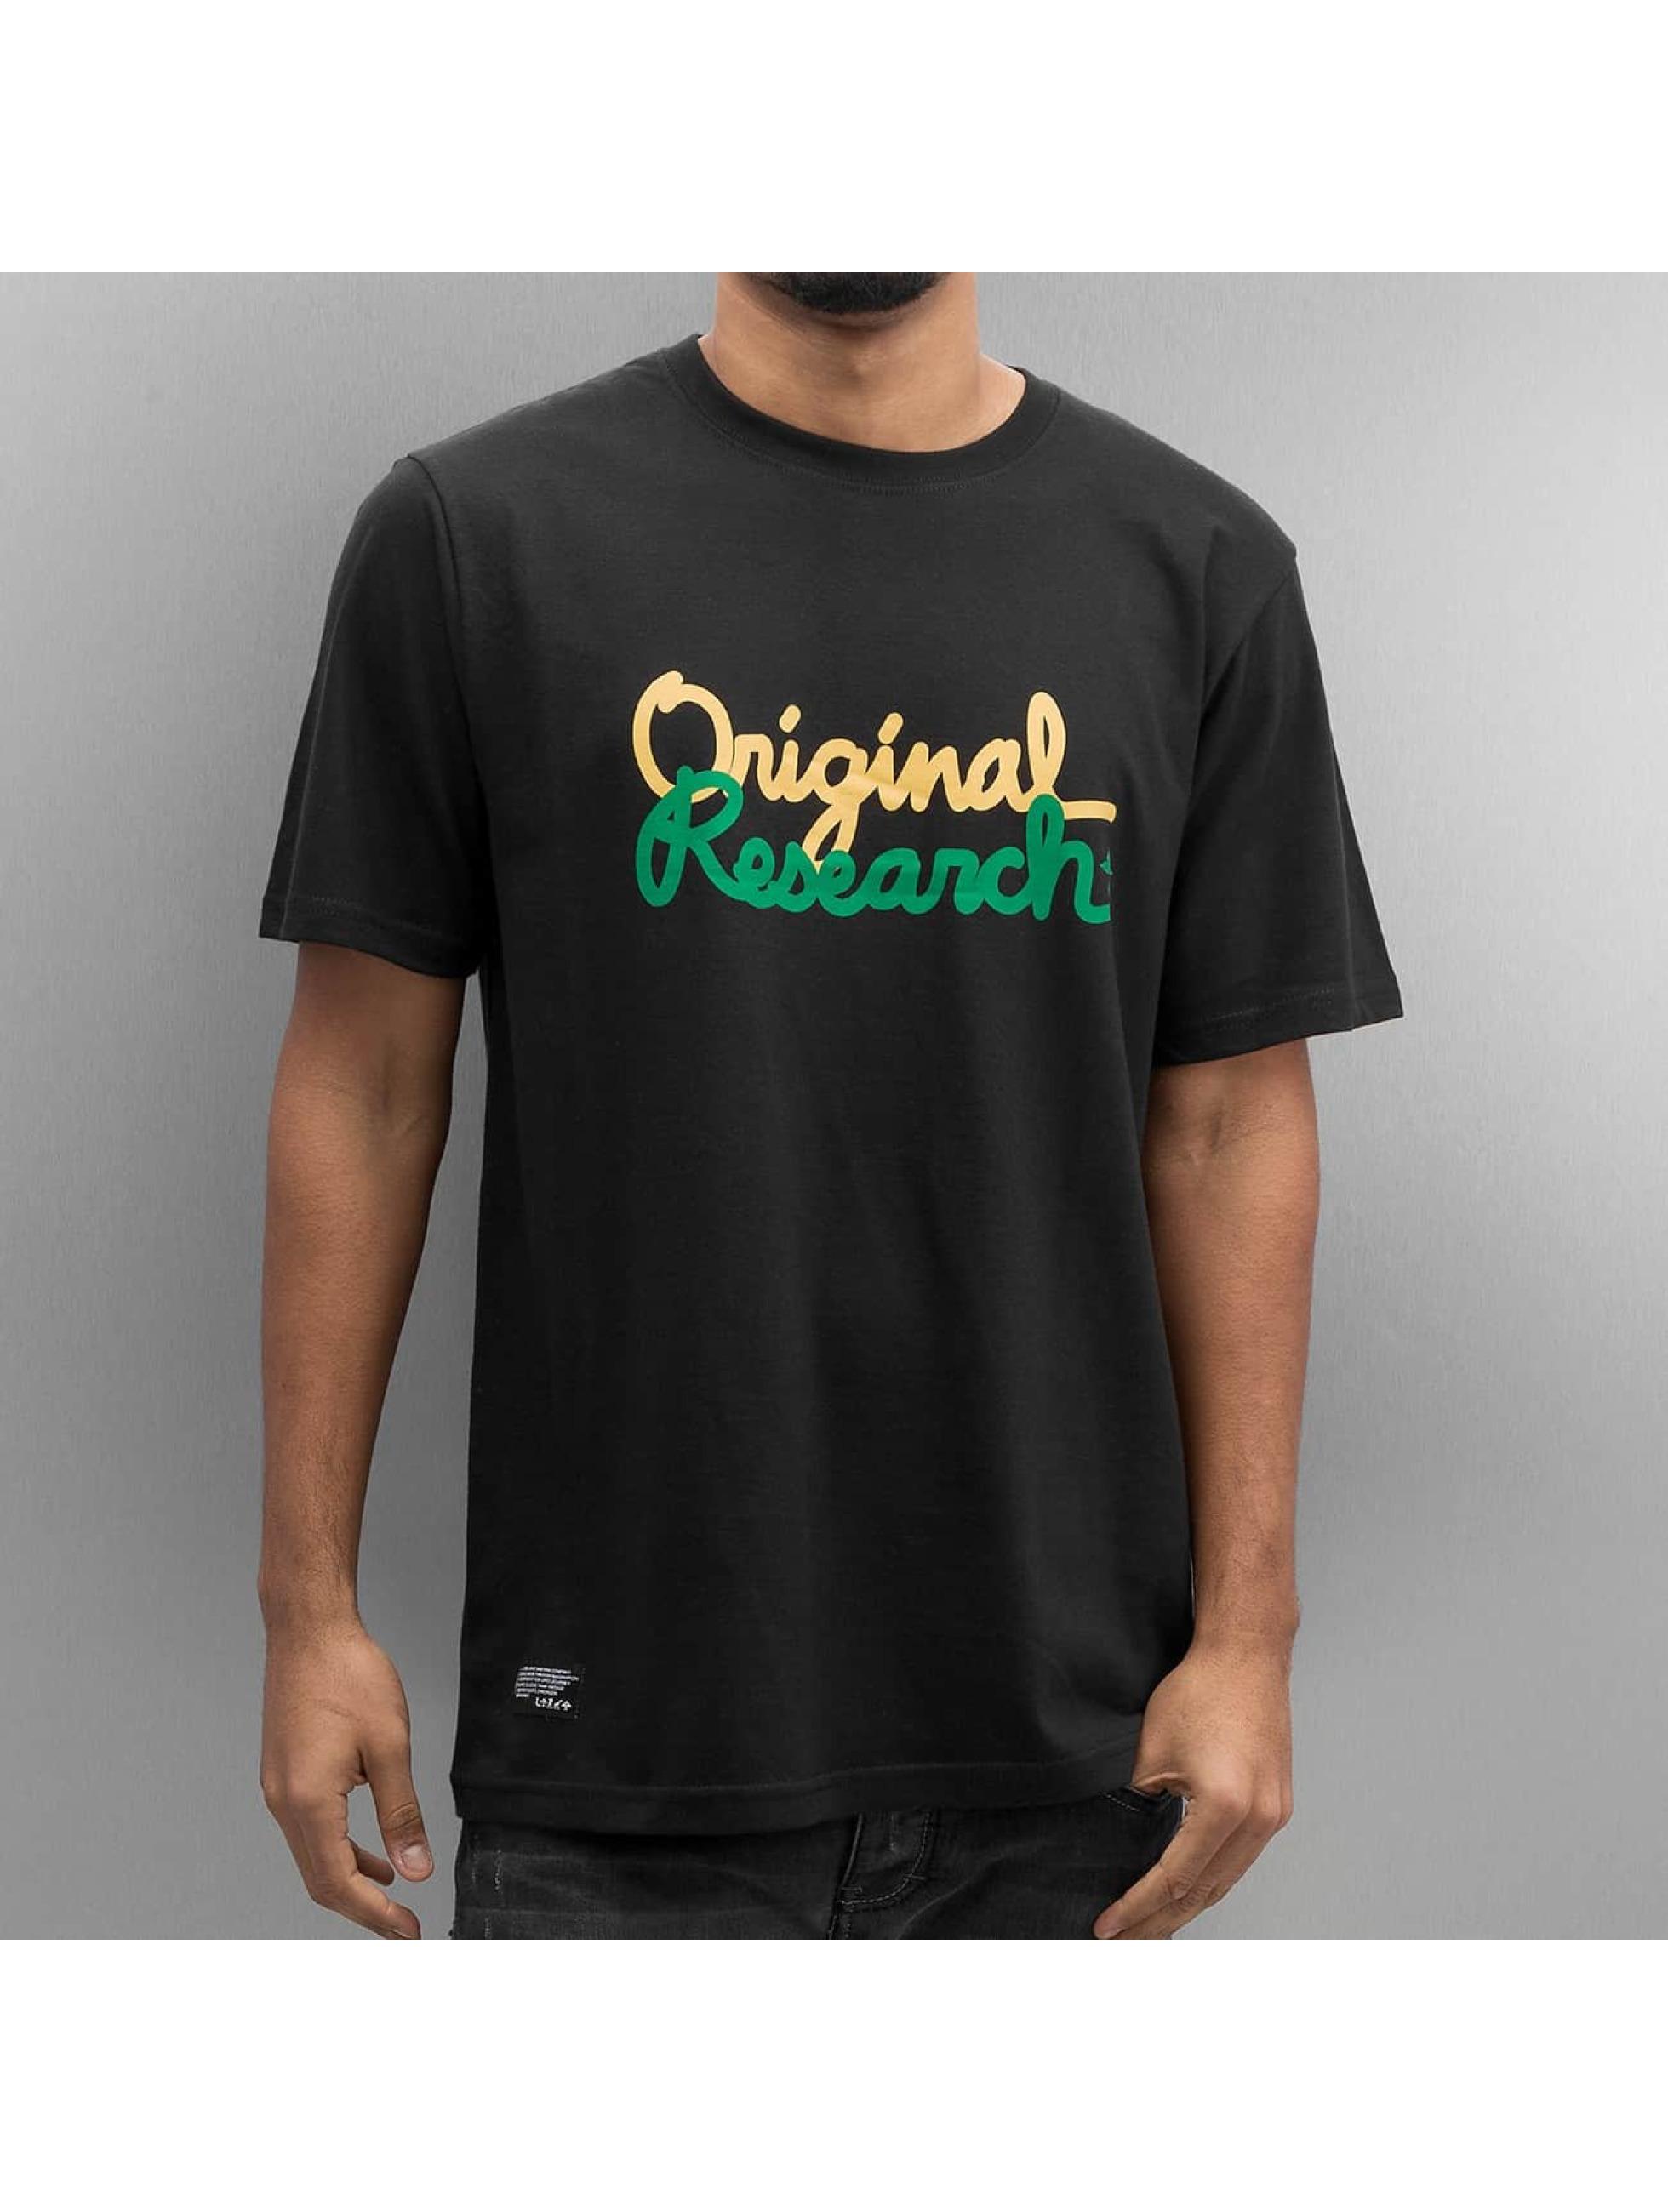 LRG T-Shirt Original Research Collection black